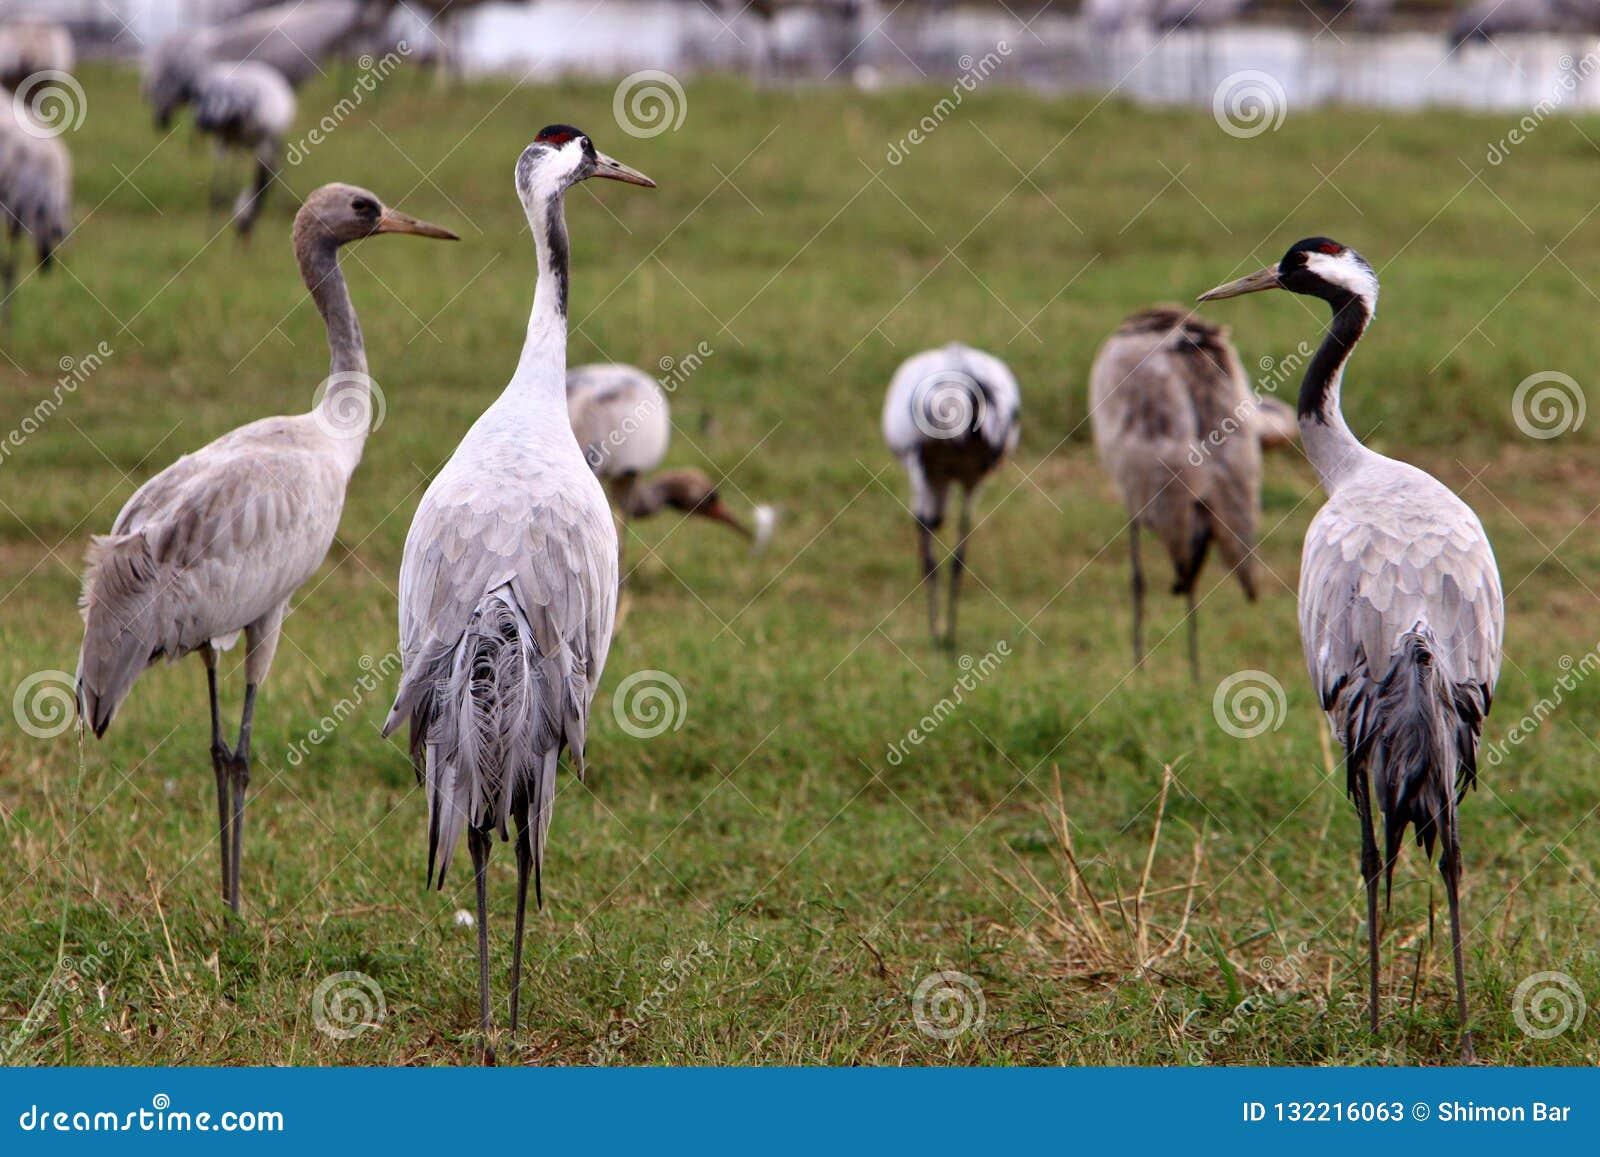 Migratory Birds In The Hula Bird Sanctuary Stock Image